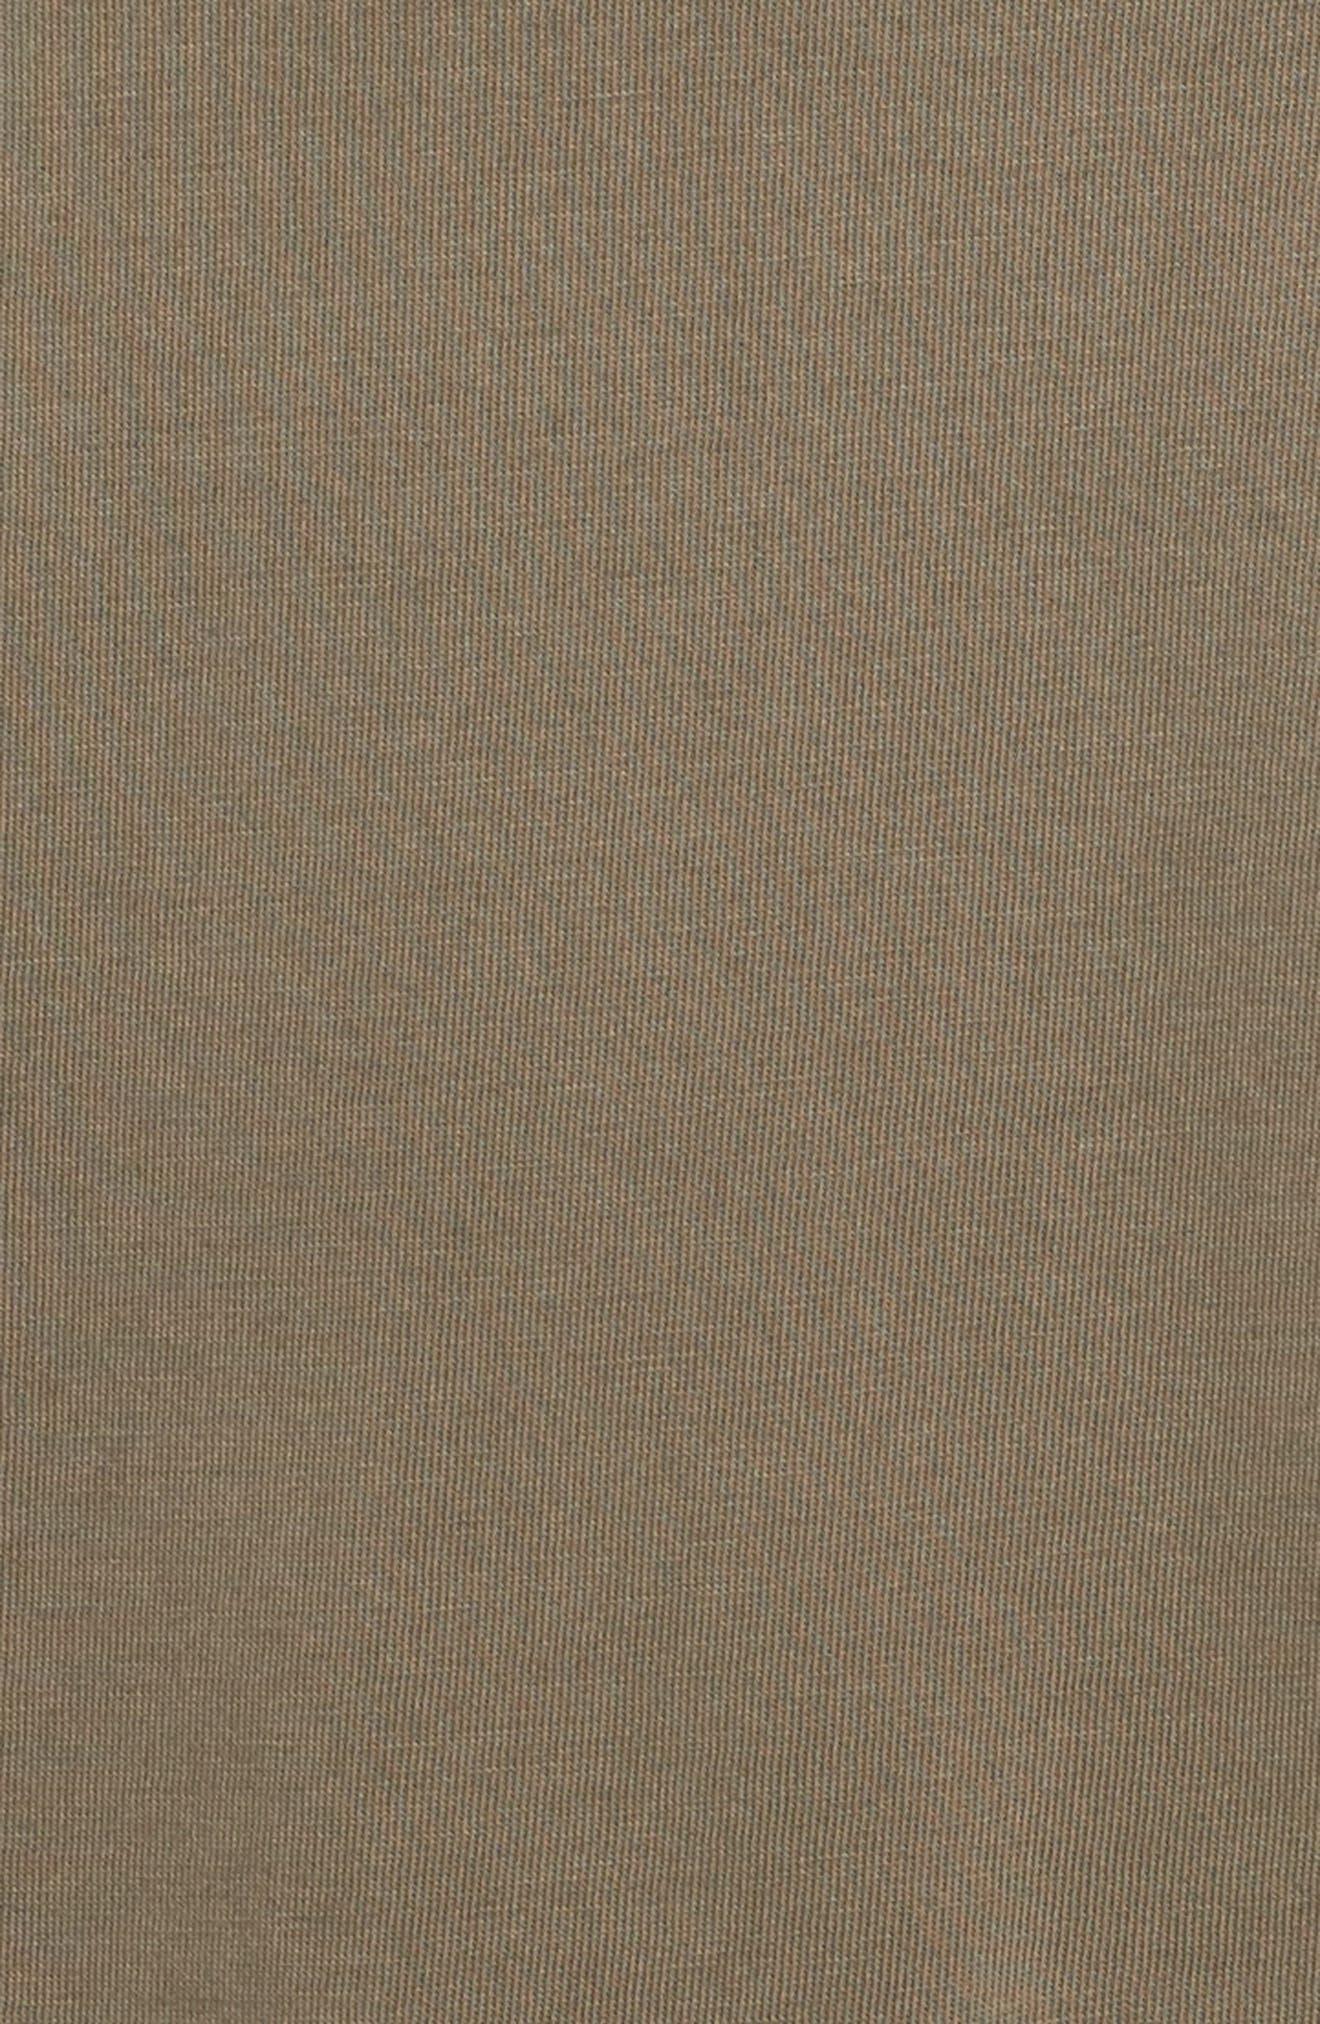 Anders Slim Fit Pocket T-Shirt,                             Alternate thumbnail 39, color,